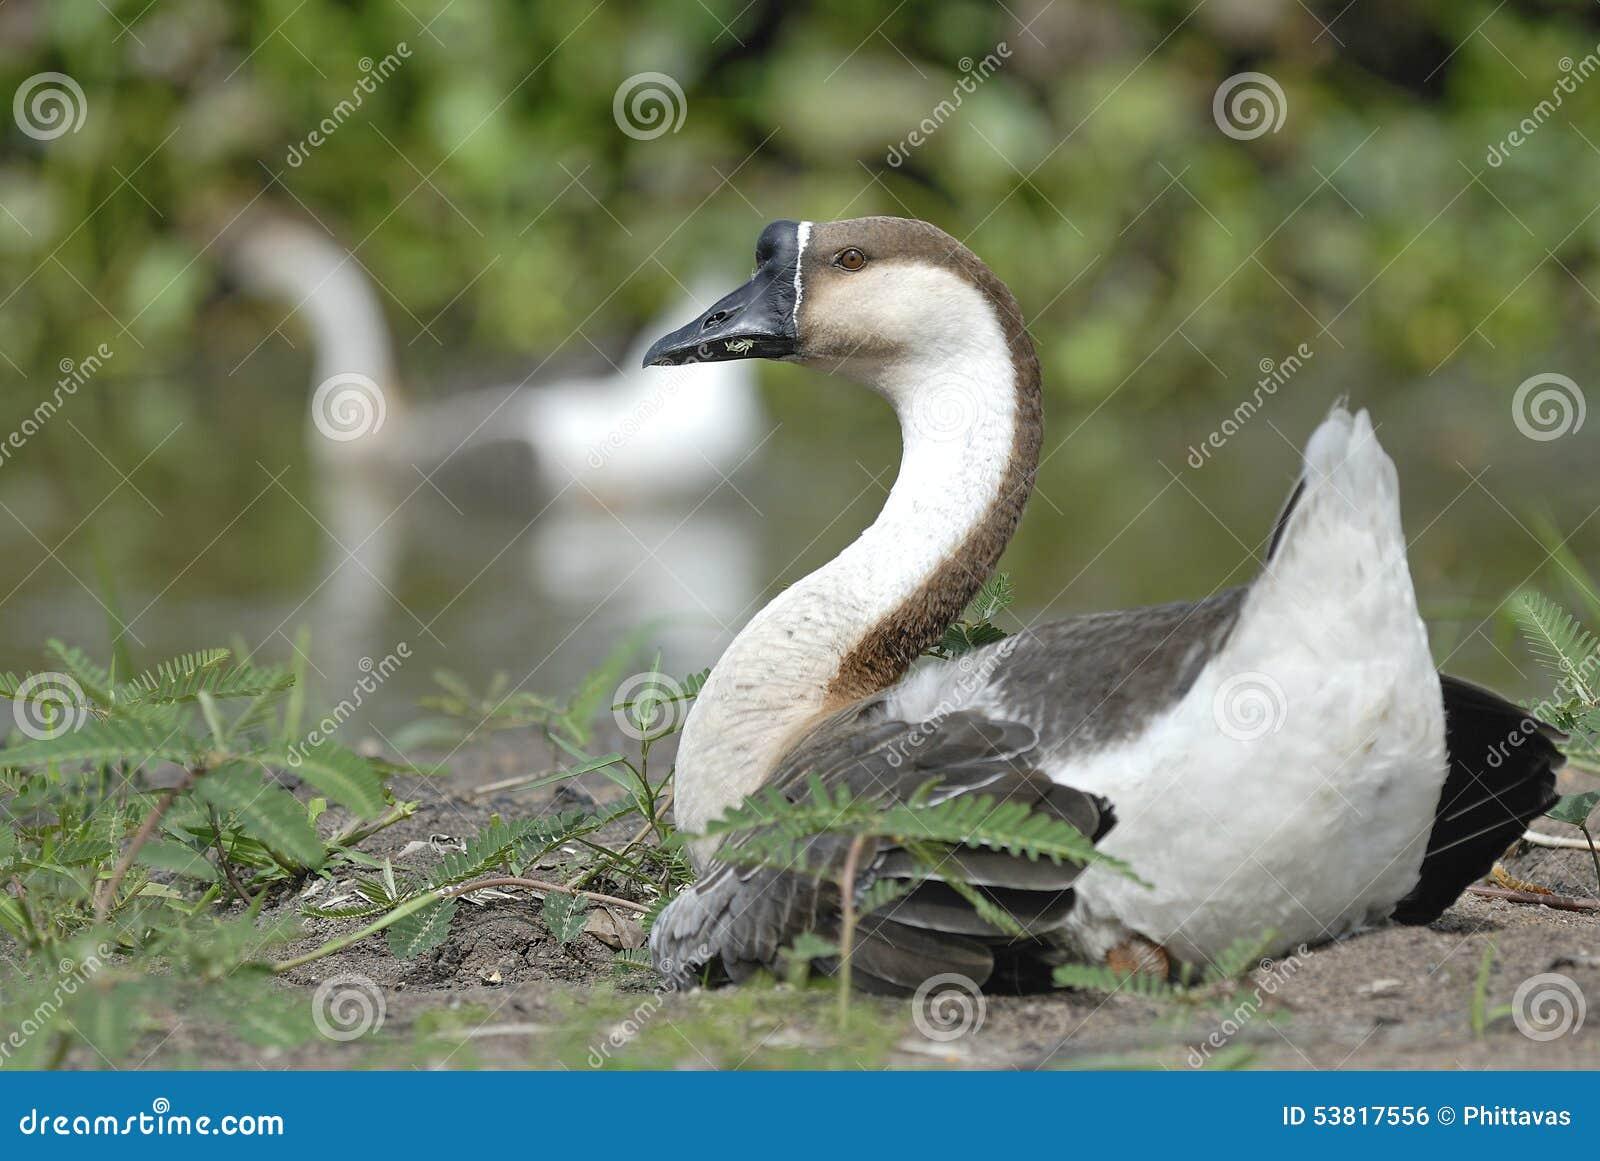 Bird Beautiful Goose Relax Near Pond Stock Photo